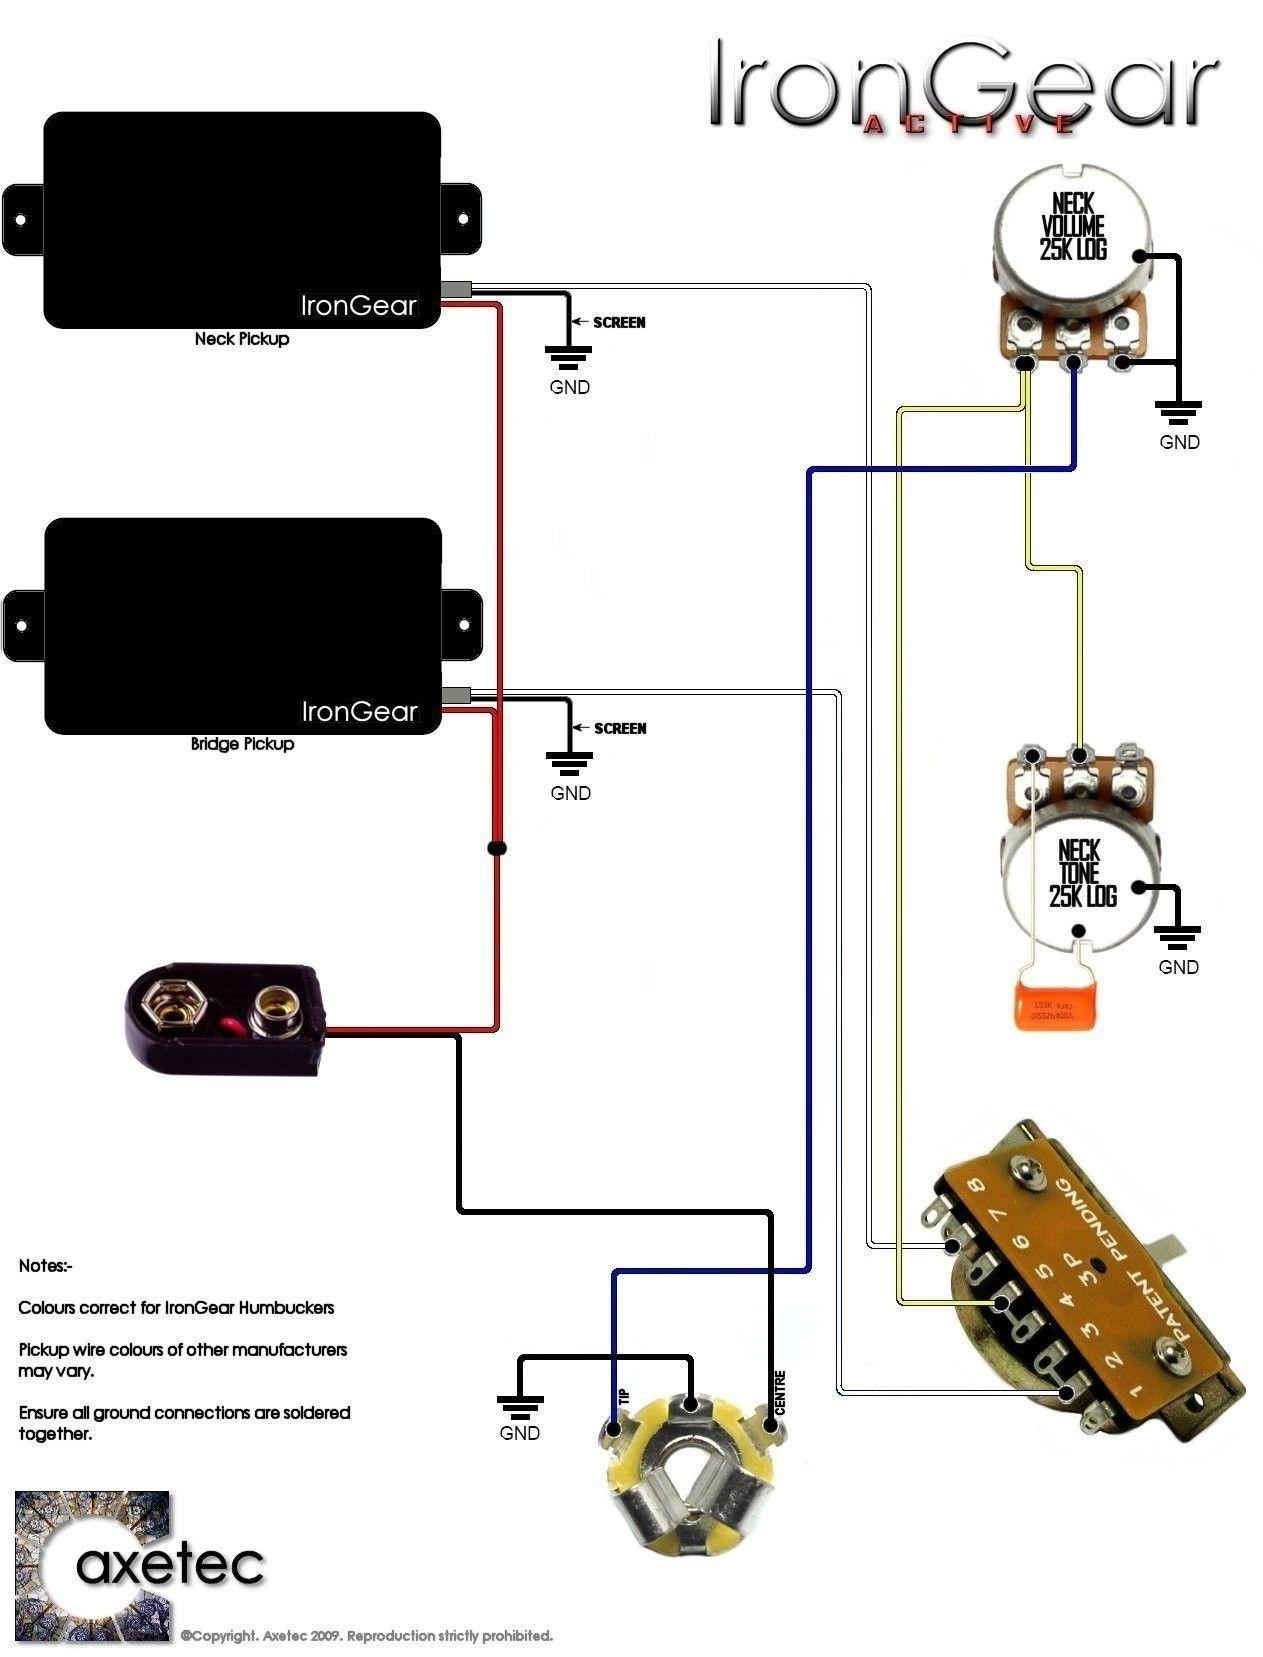 Elegant Emg Hz Pickups Wiring Diagram In 2020 Wire Diagram Chart Guitar